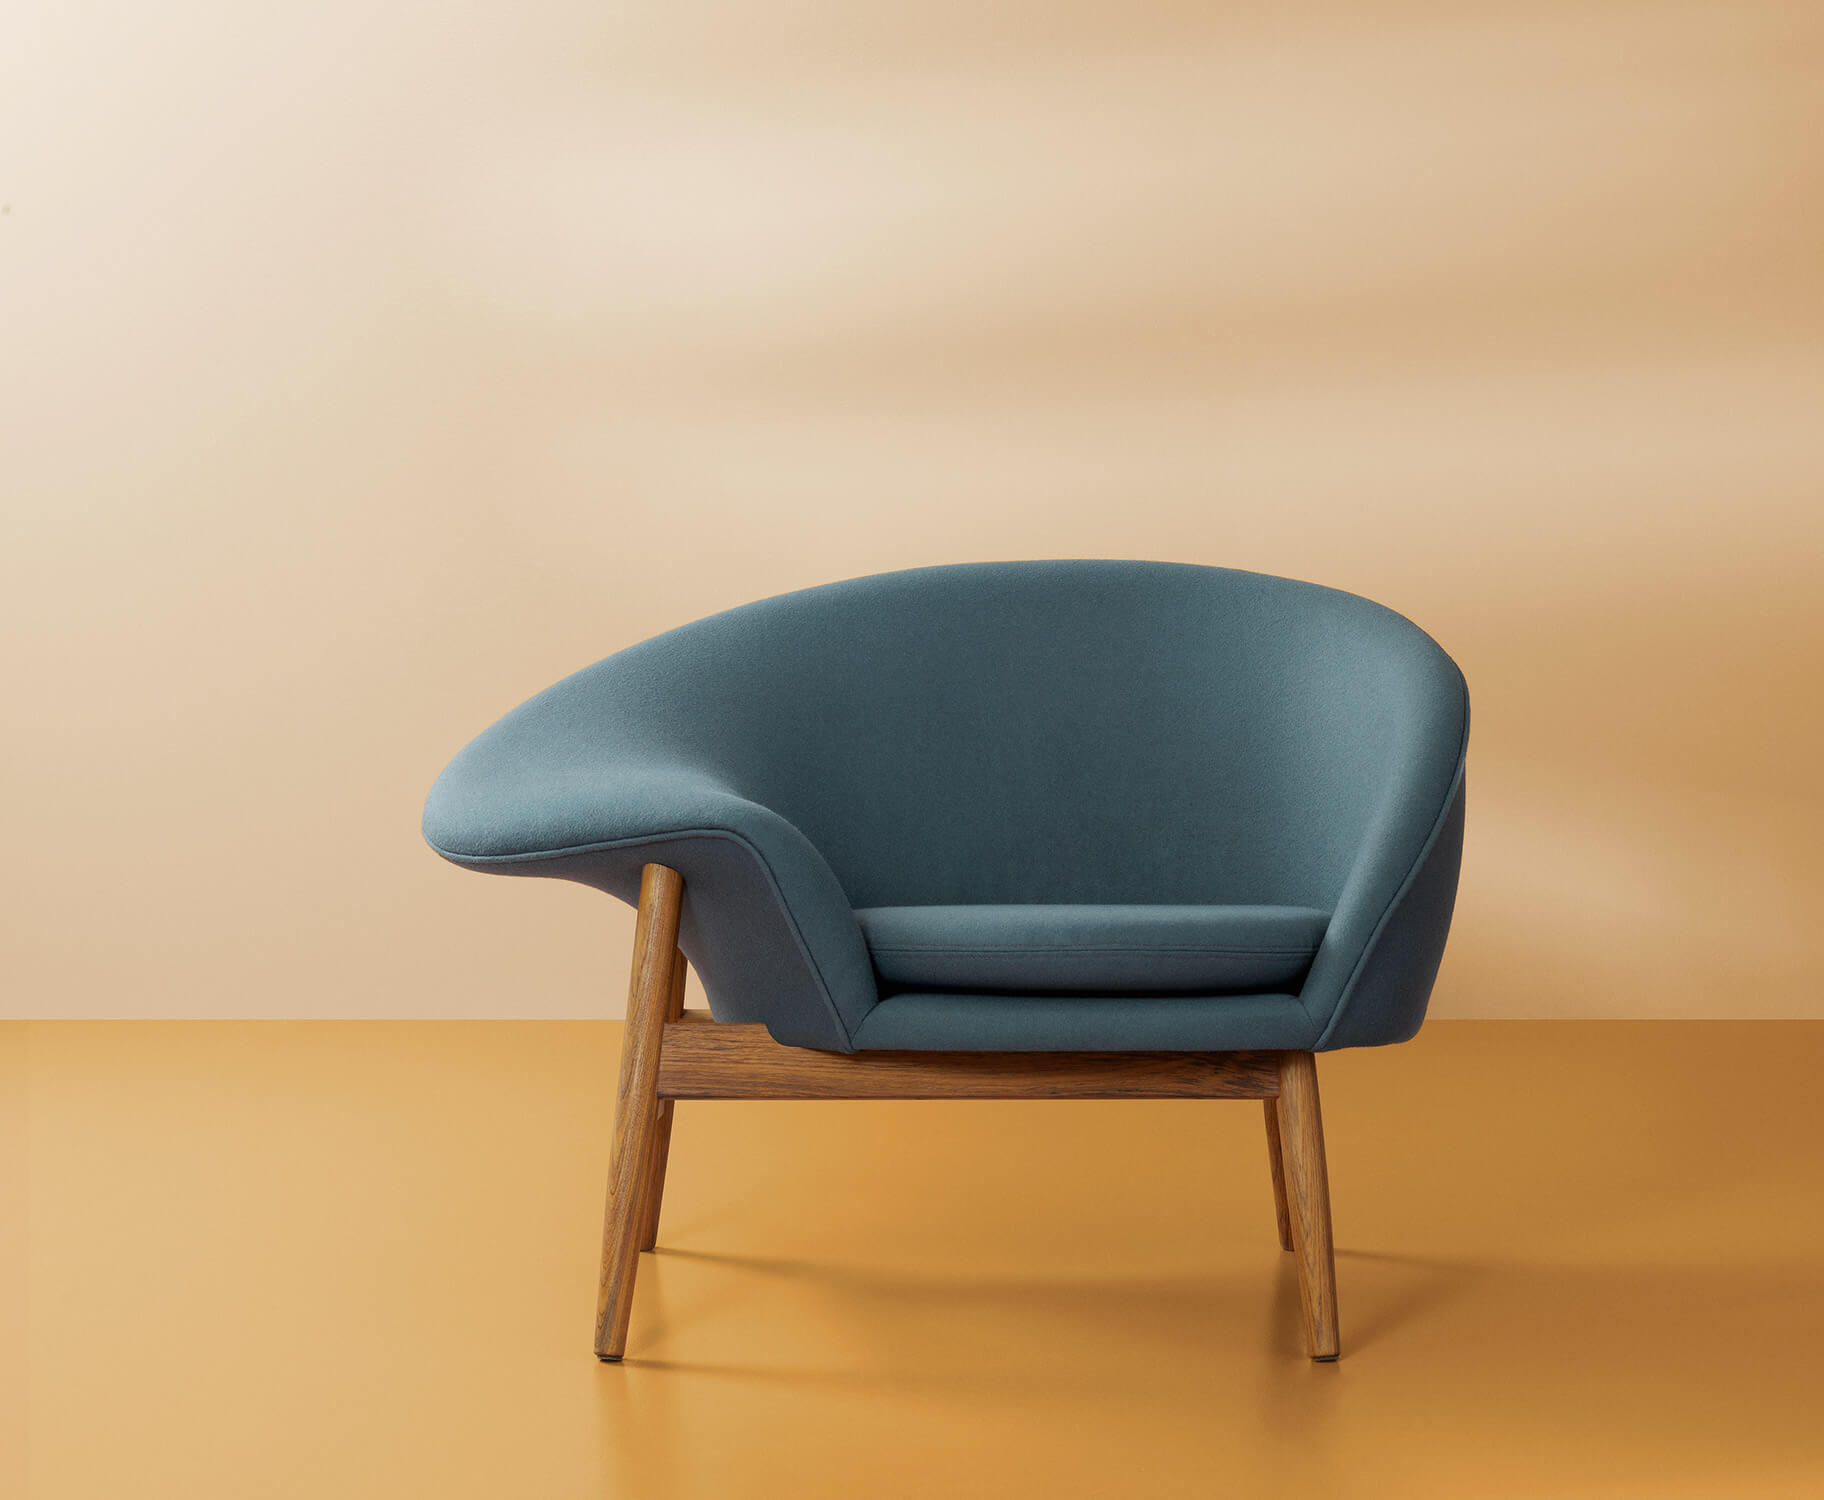 Reintroducing The Fried Egg Chair Azure Magazine Azure Magazine